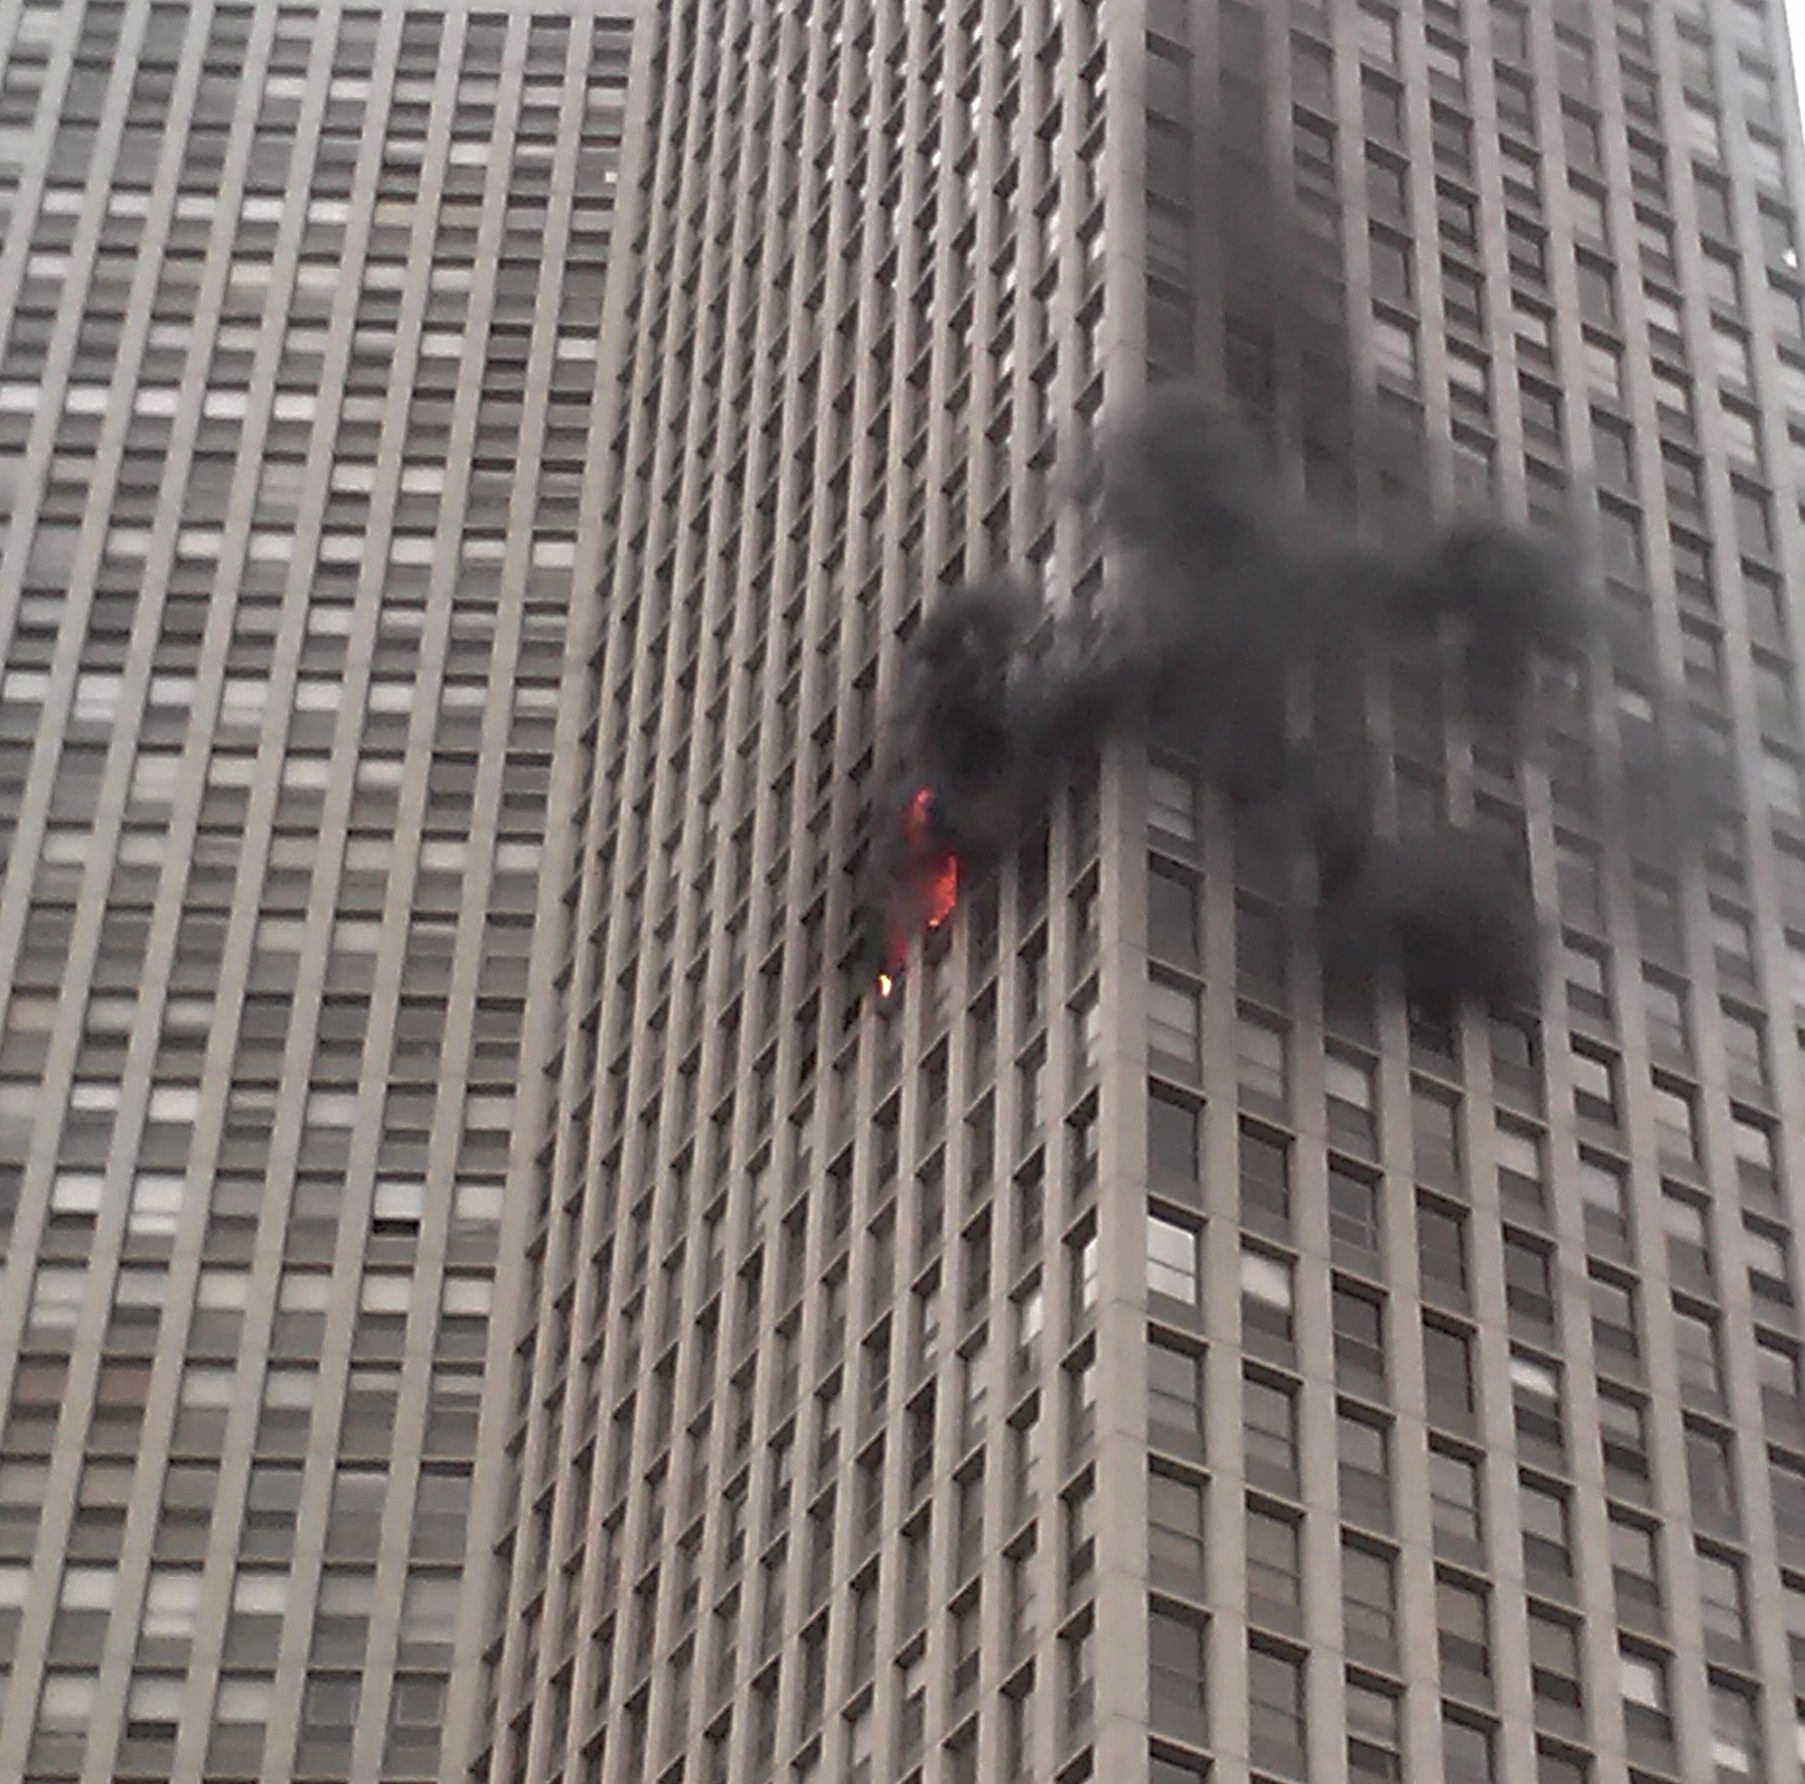 Chicago_Lincoln_Park_High-Rise_fire_2012.jpg